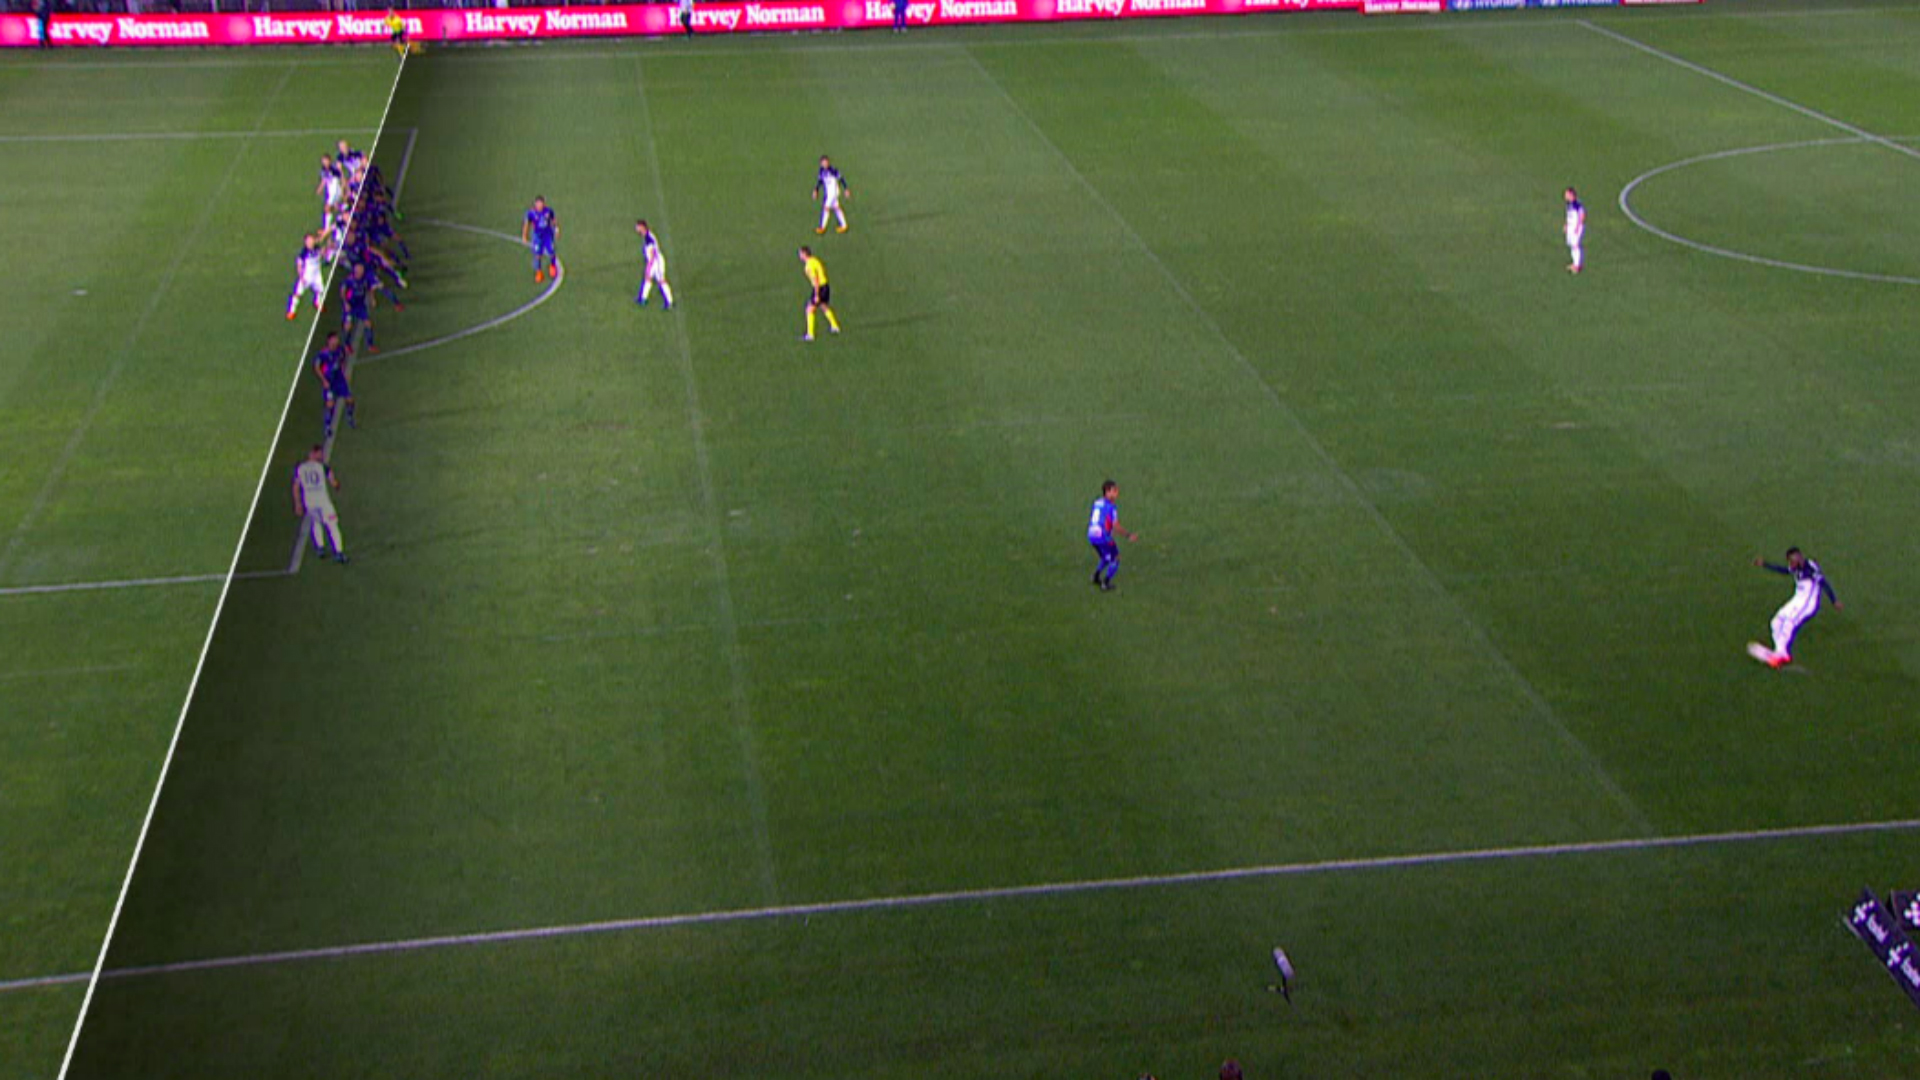 Melbourne Victory offside